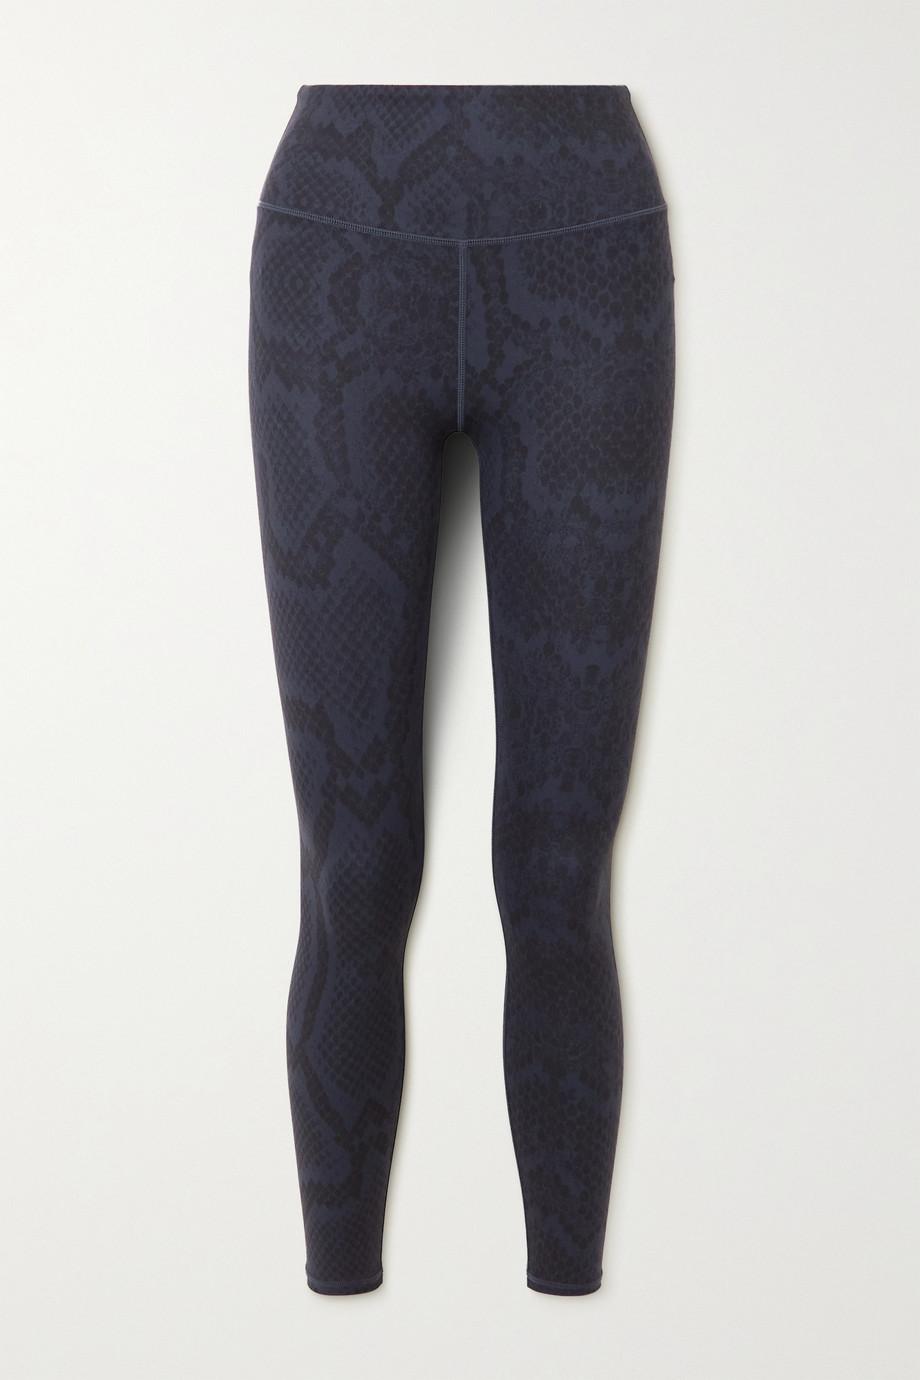 Varley Century snake-print stretch leggings